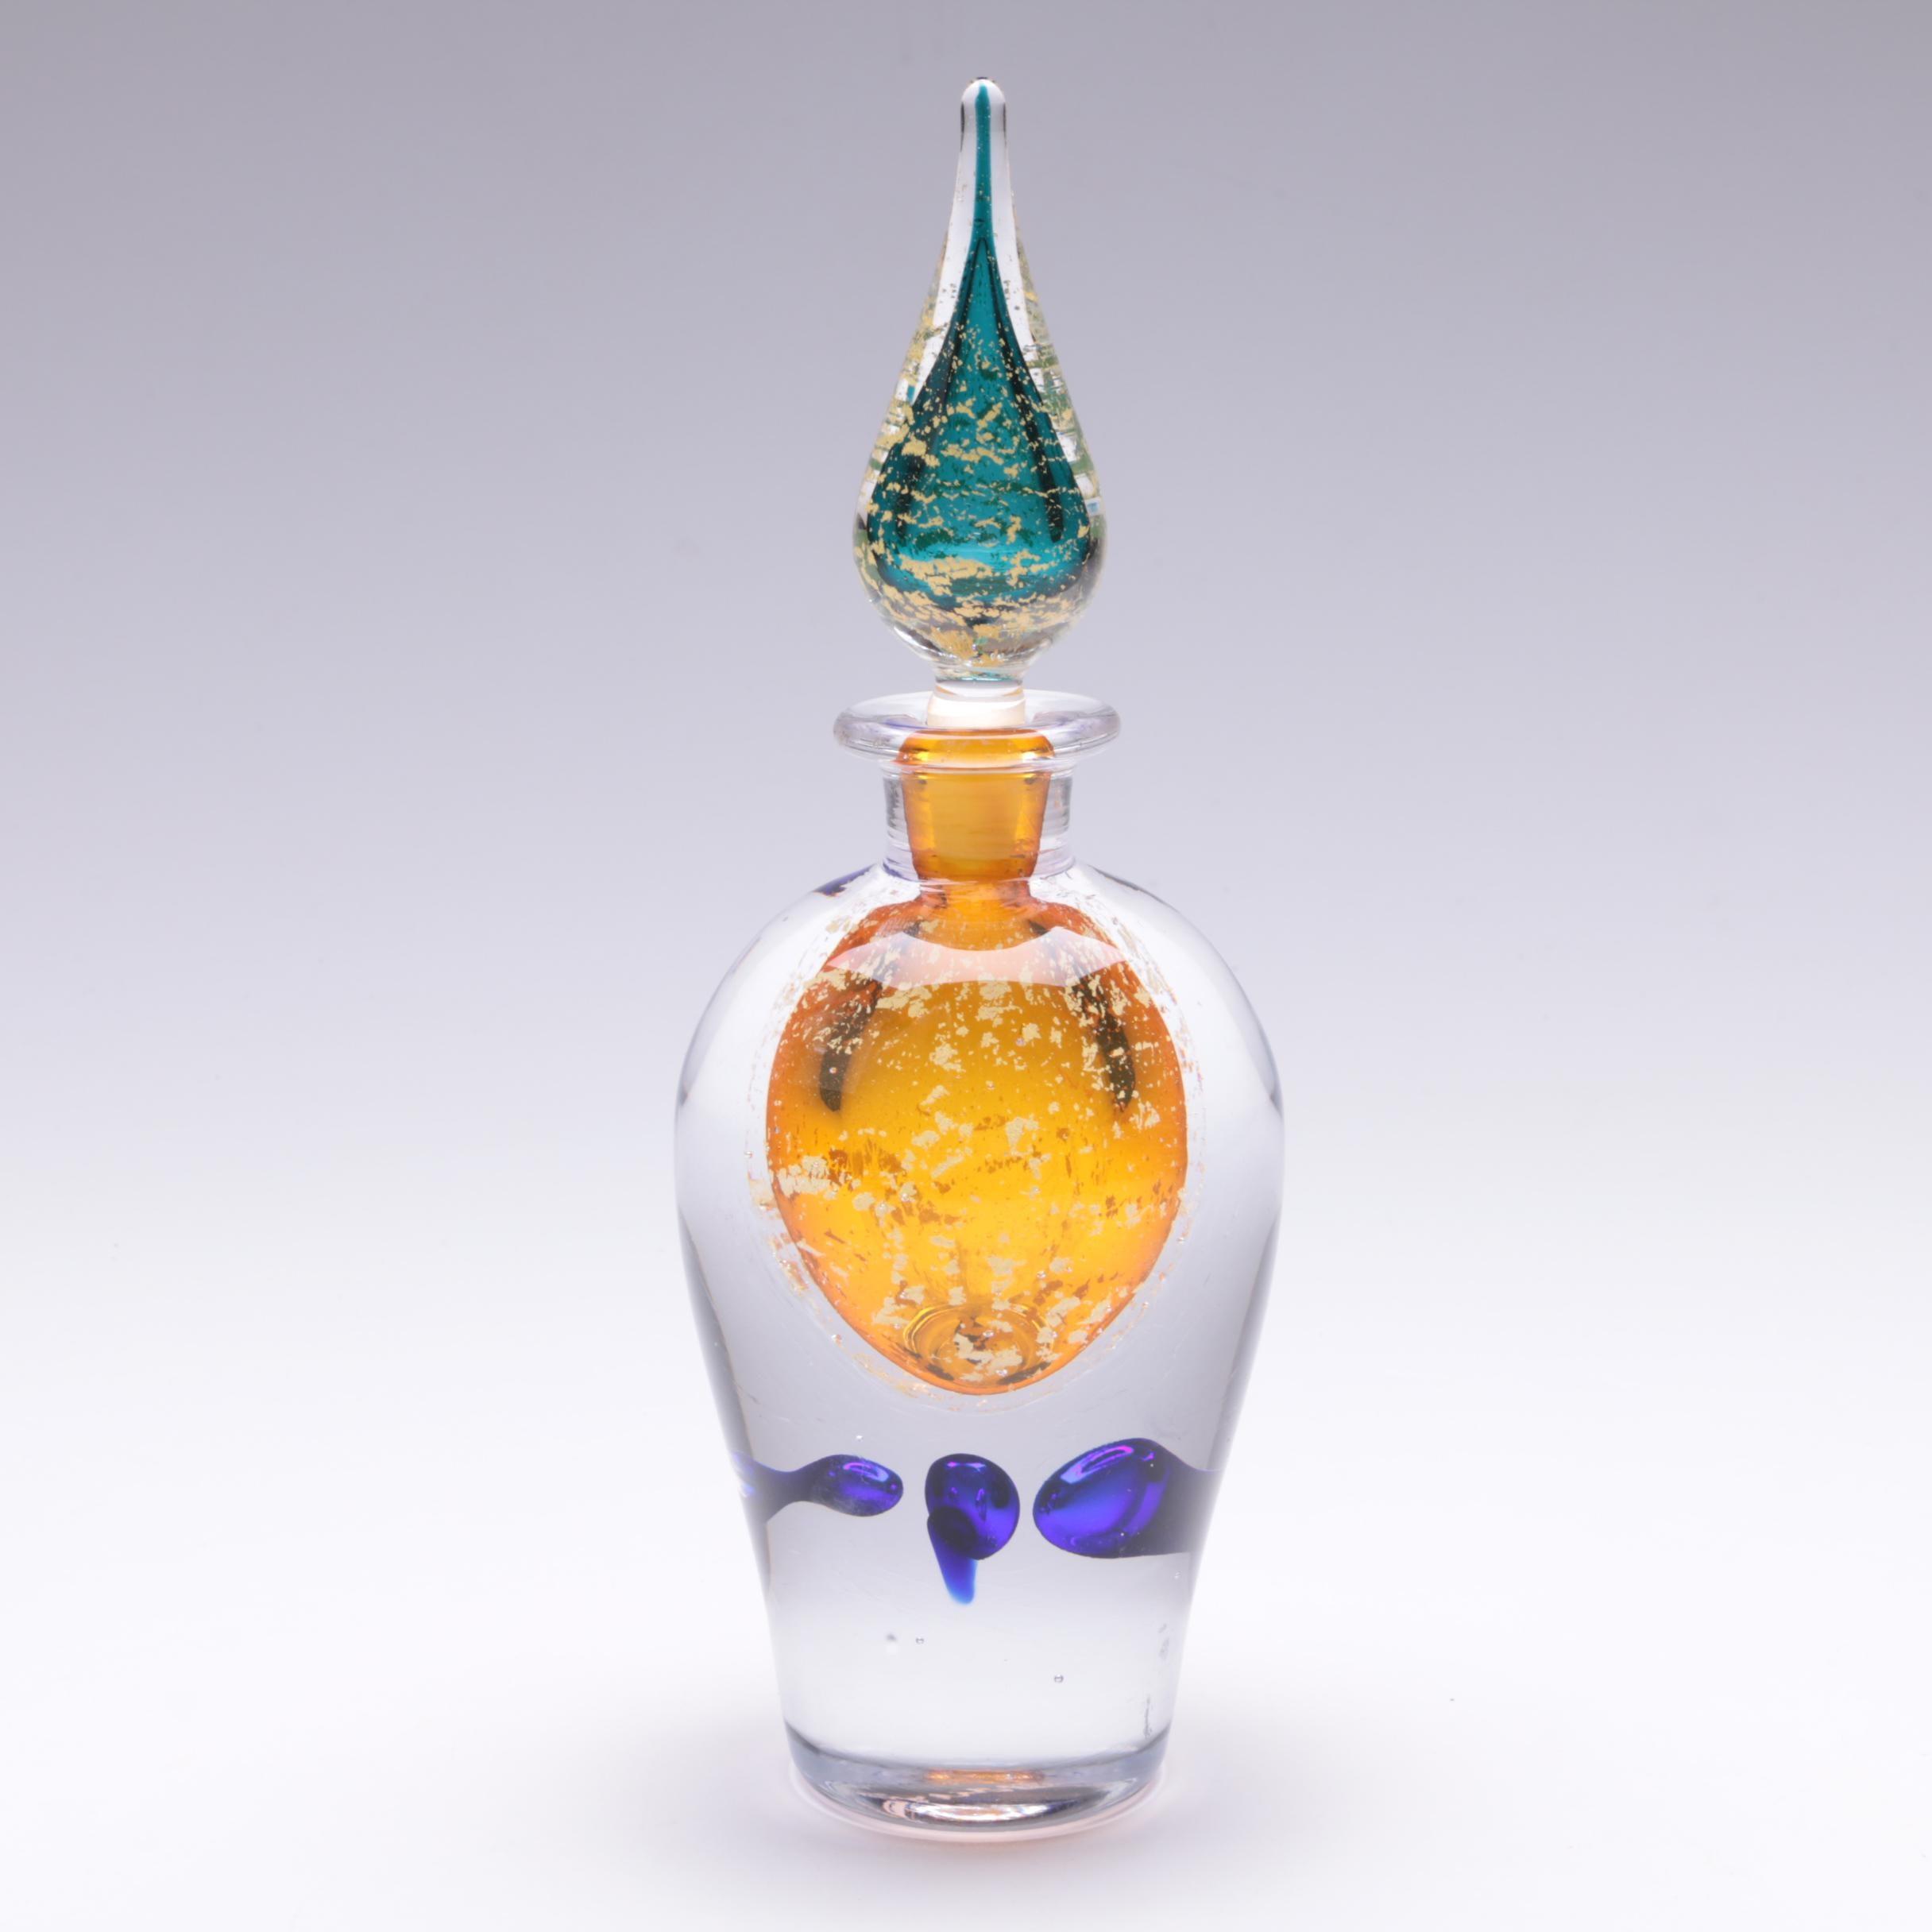 Signed Vibrant Art Glass Decanter